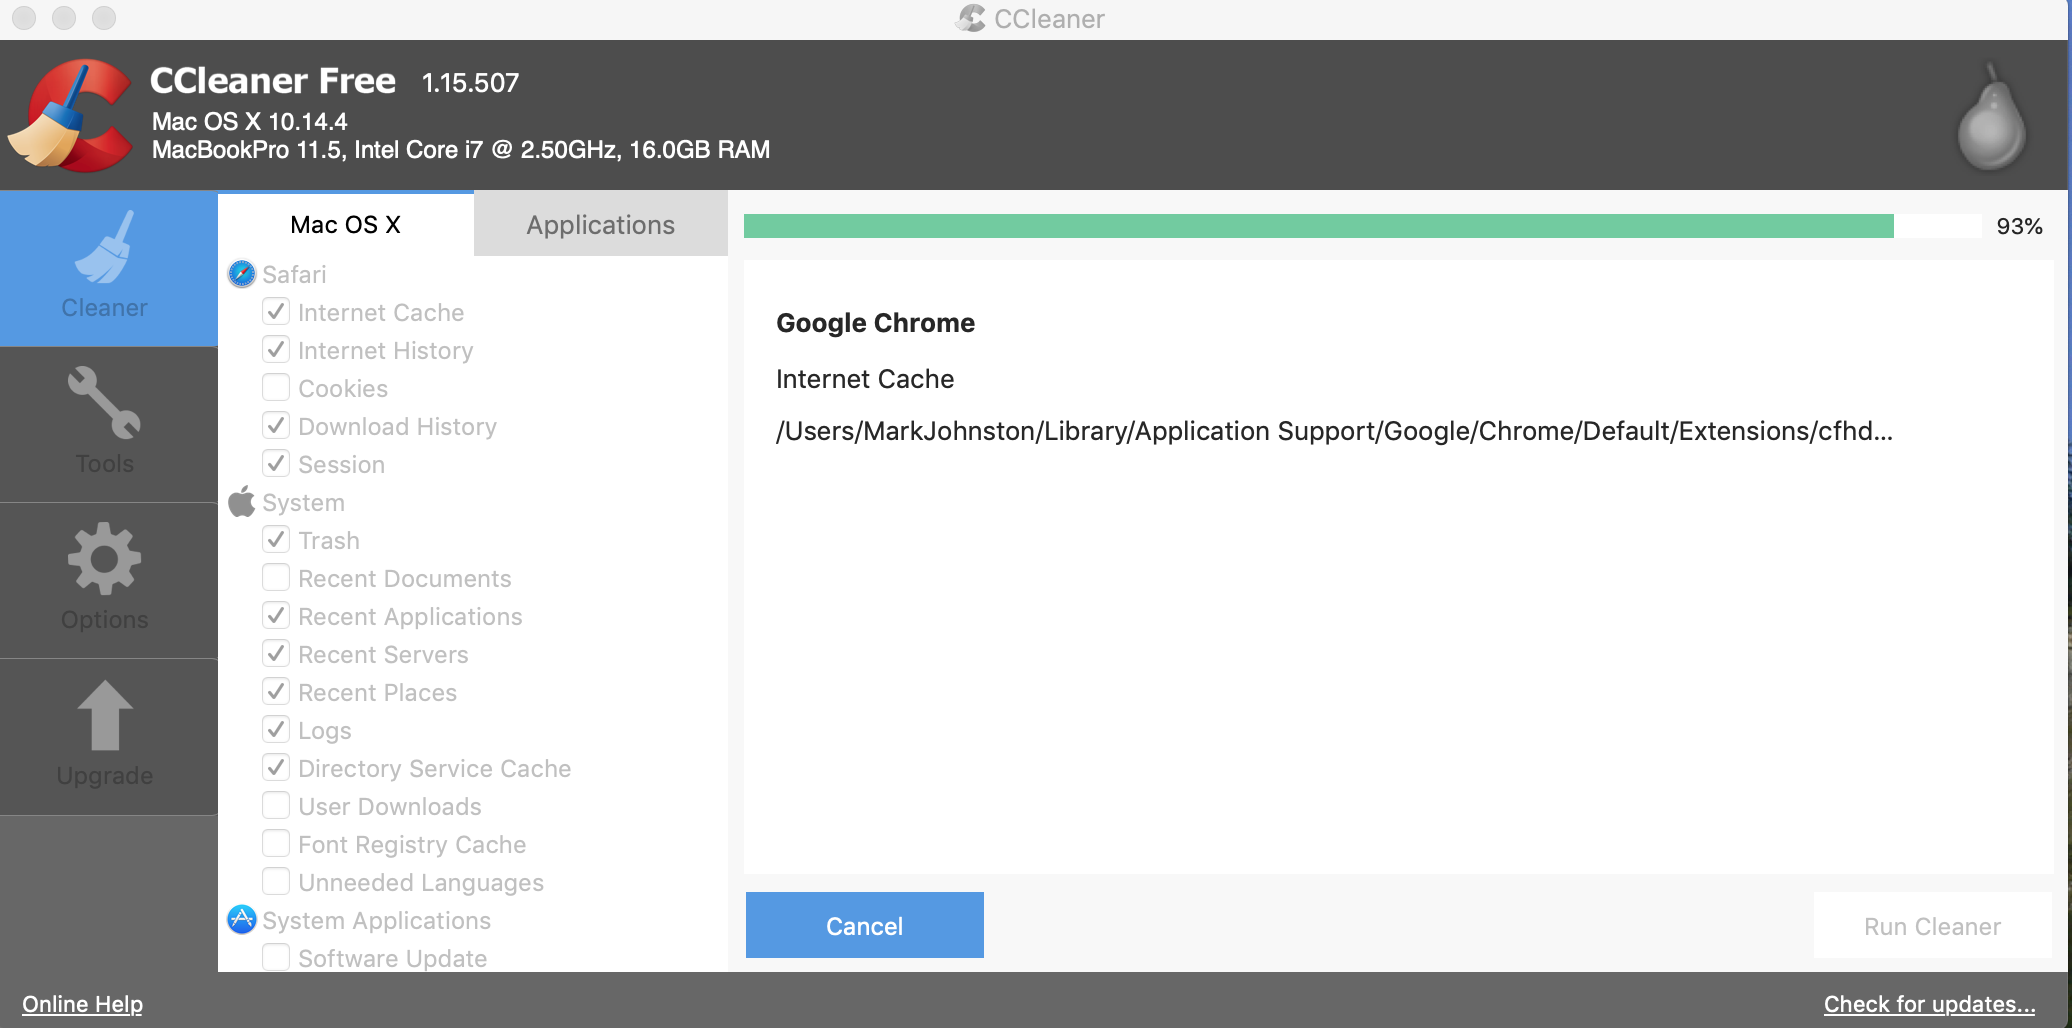 CCleaner for Mac hangs - CCleaner for Mac - CCleaner